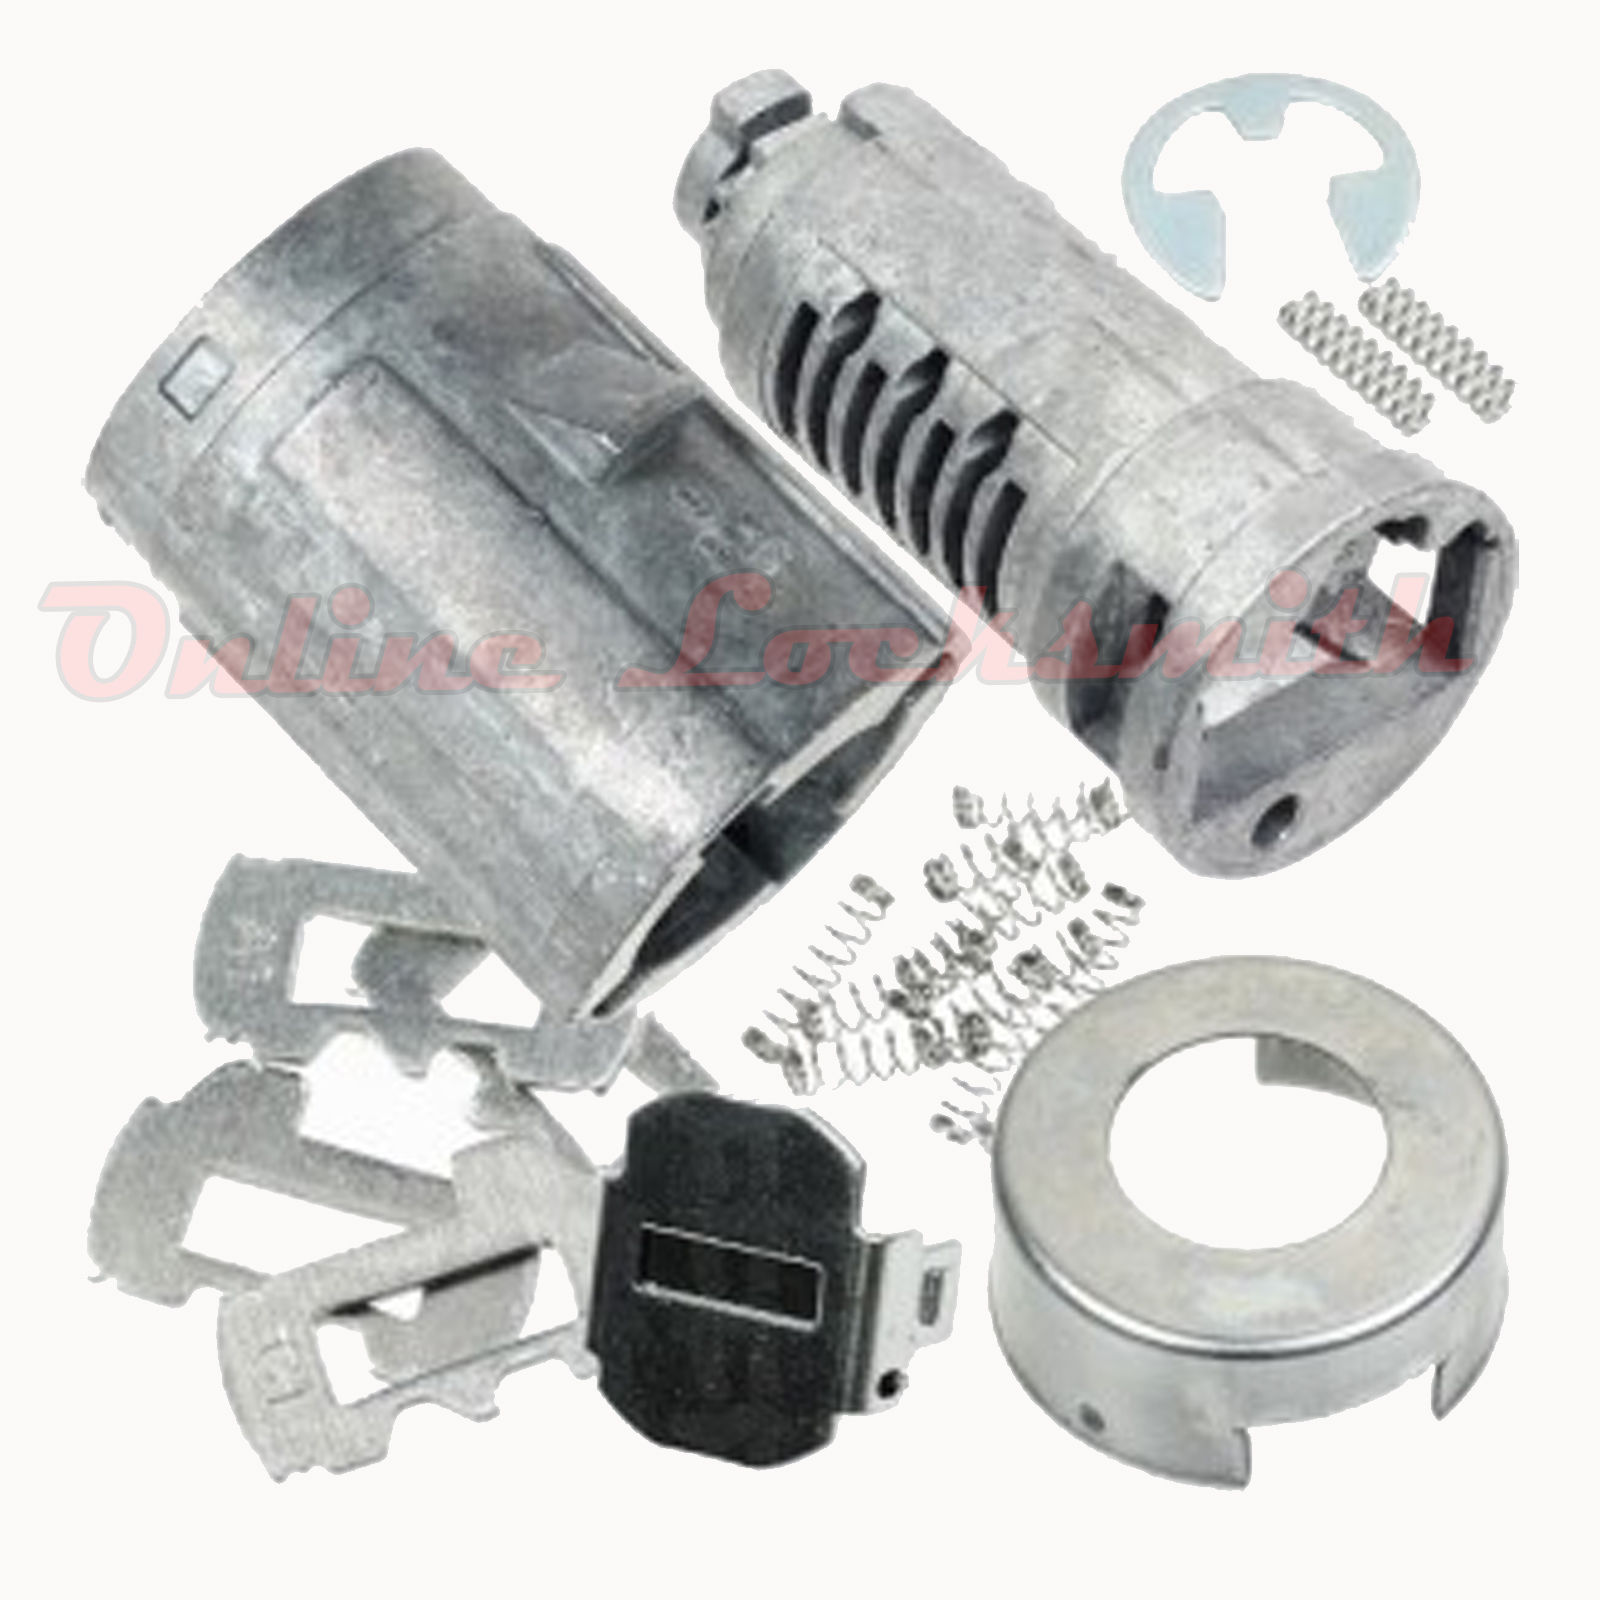 709273 Oem Door Lock Cylinder Replacement Kit Cadillac